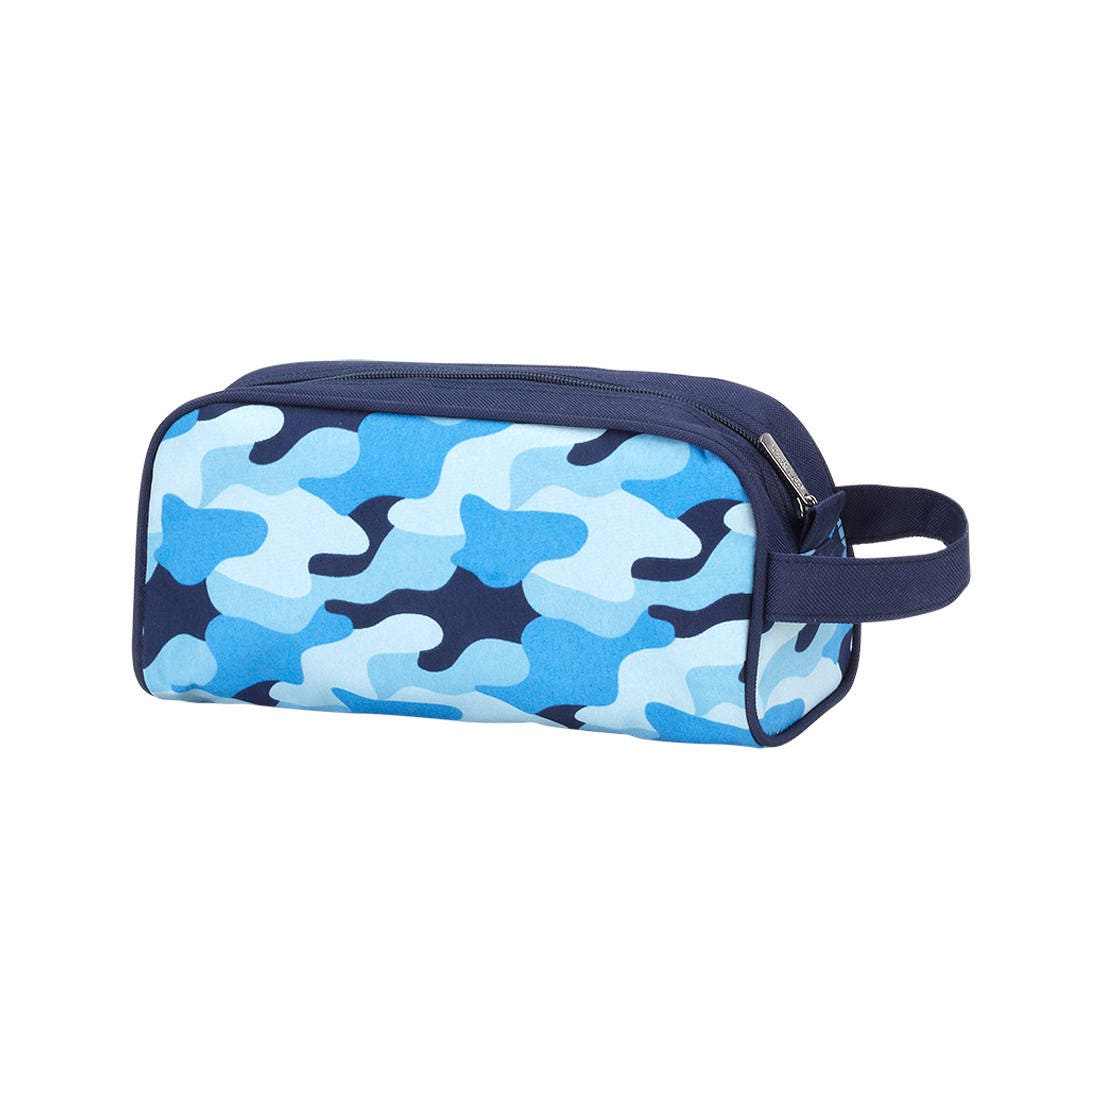 8c9b1eebd27d Personalize Toiletry Bag Cool Camo